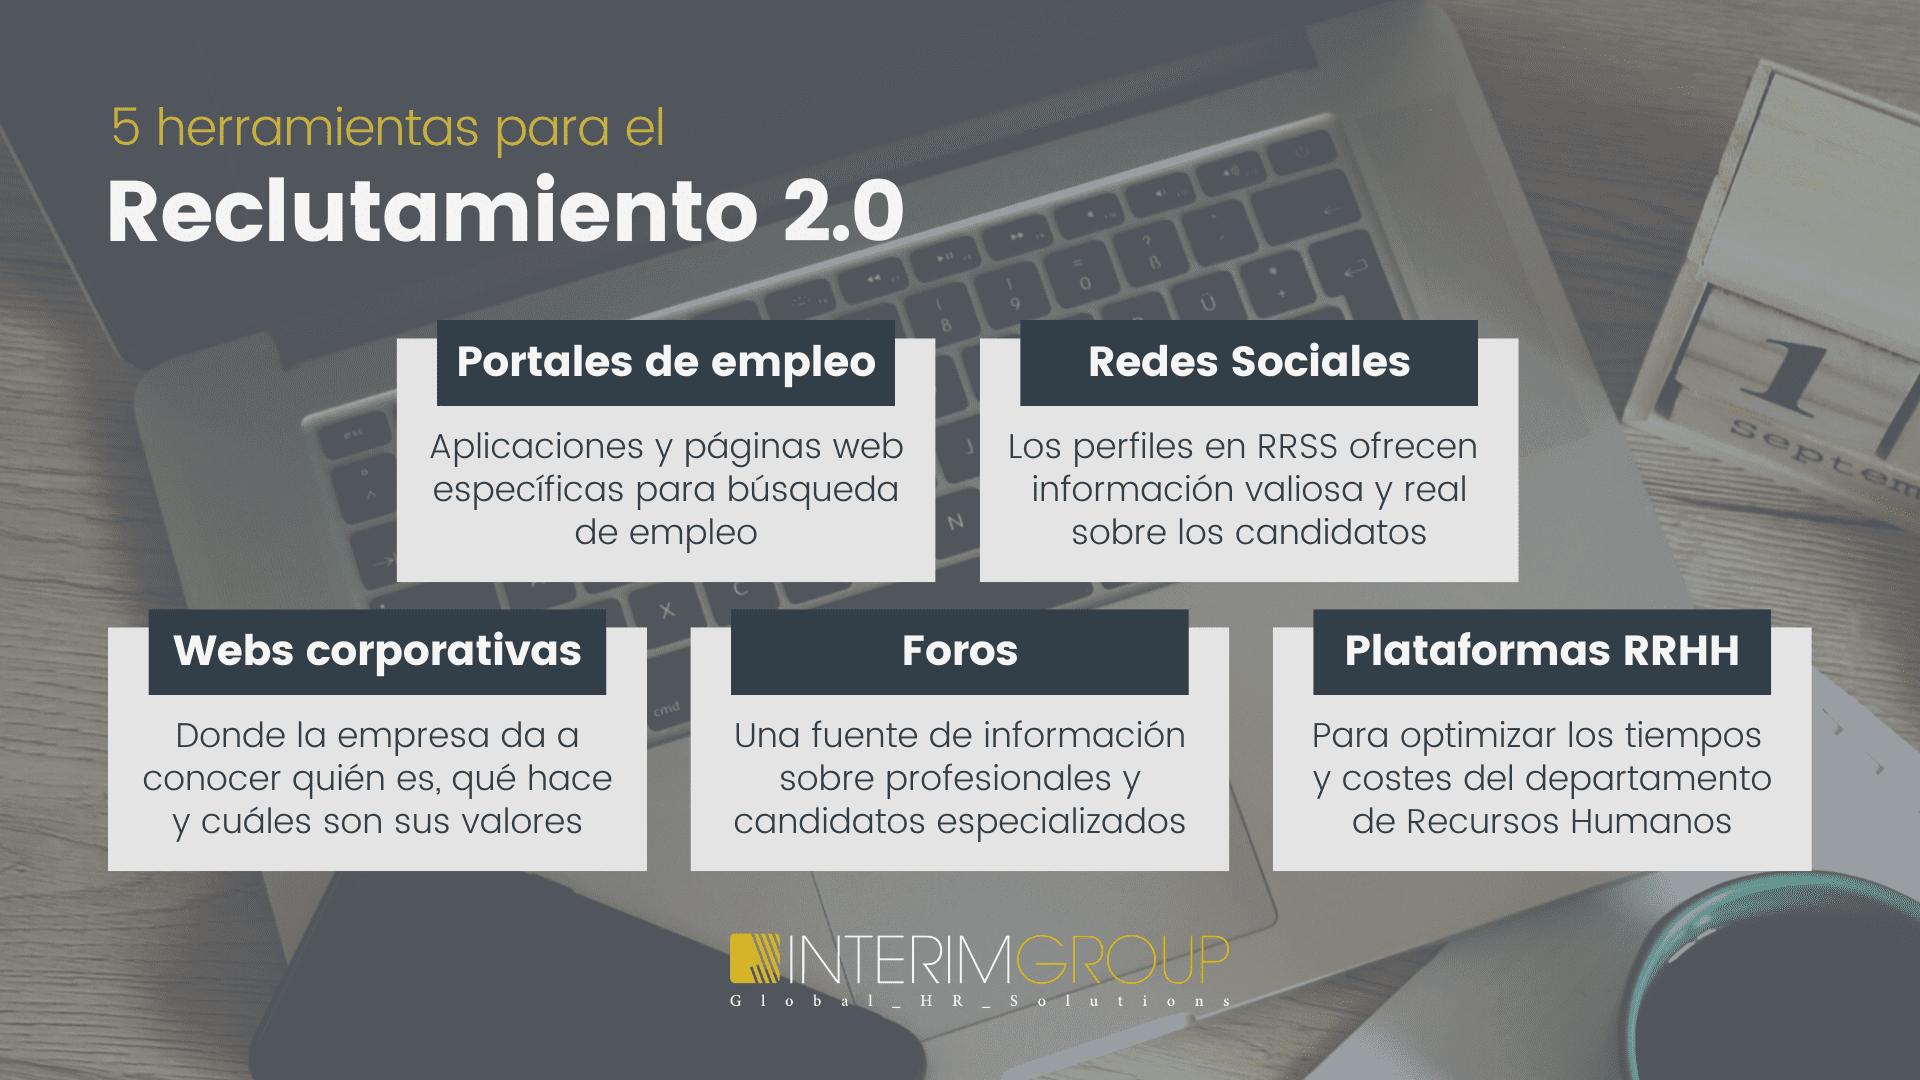 Reclutamiento-2-0-herramientas_INTERIM_GROUP